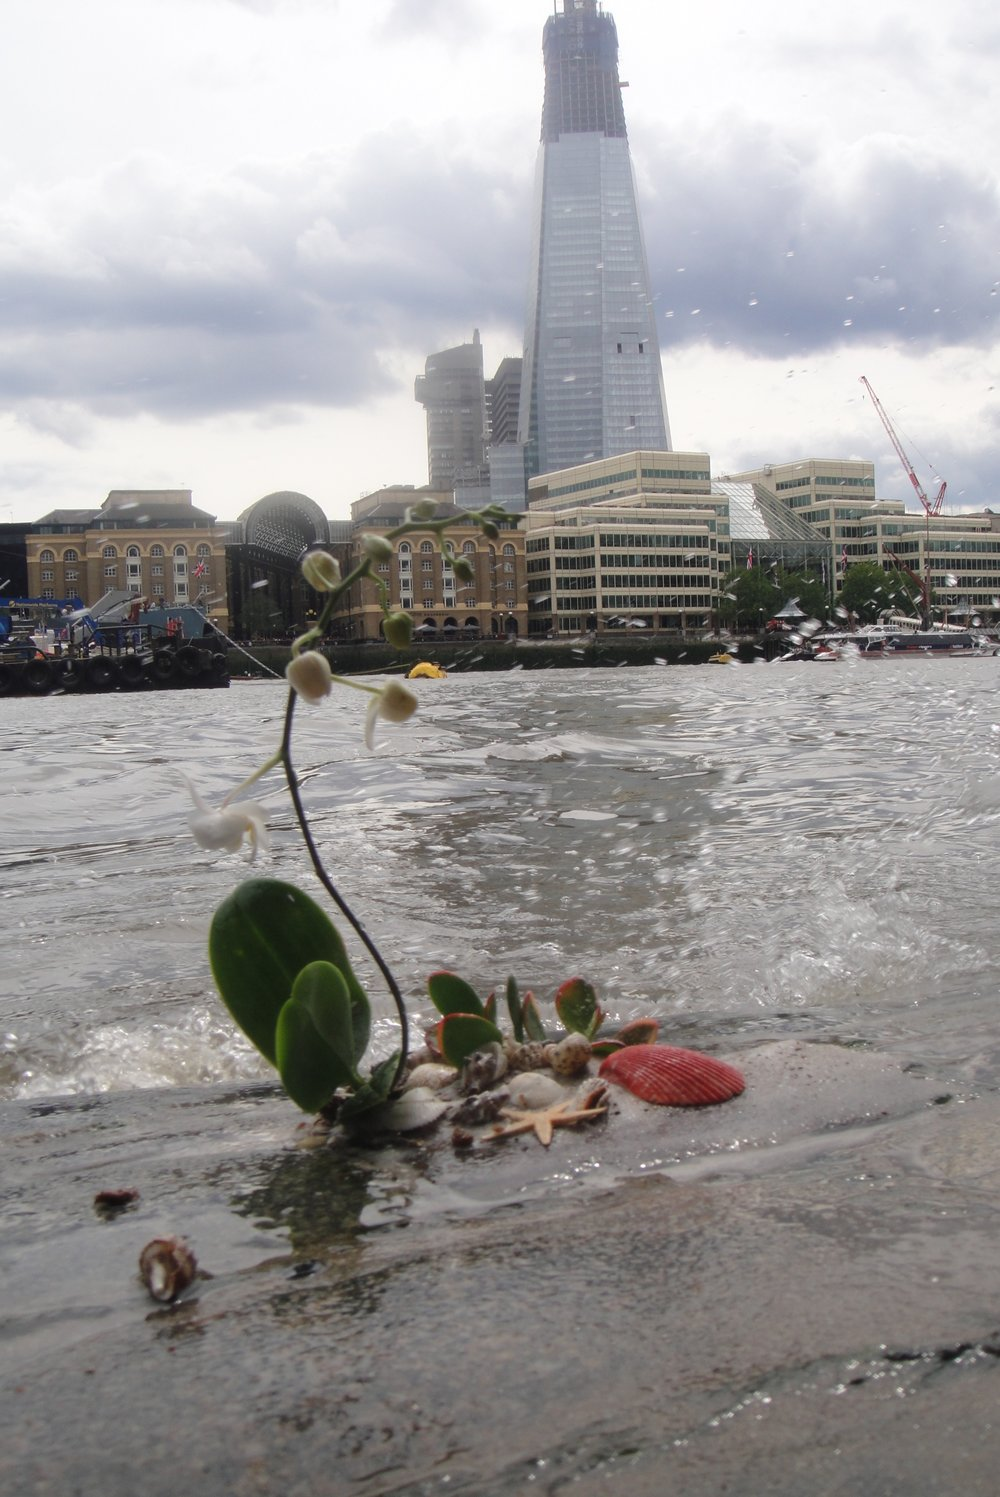 London pothole garden thames spike